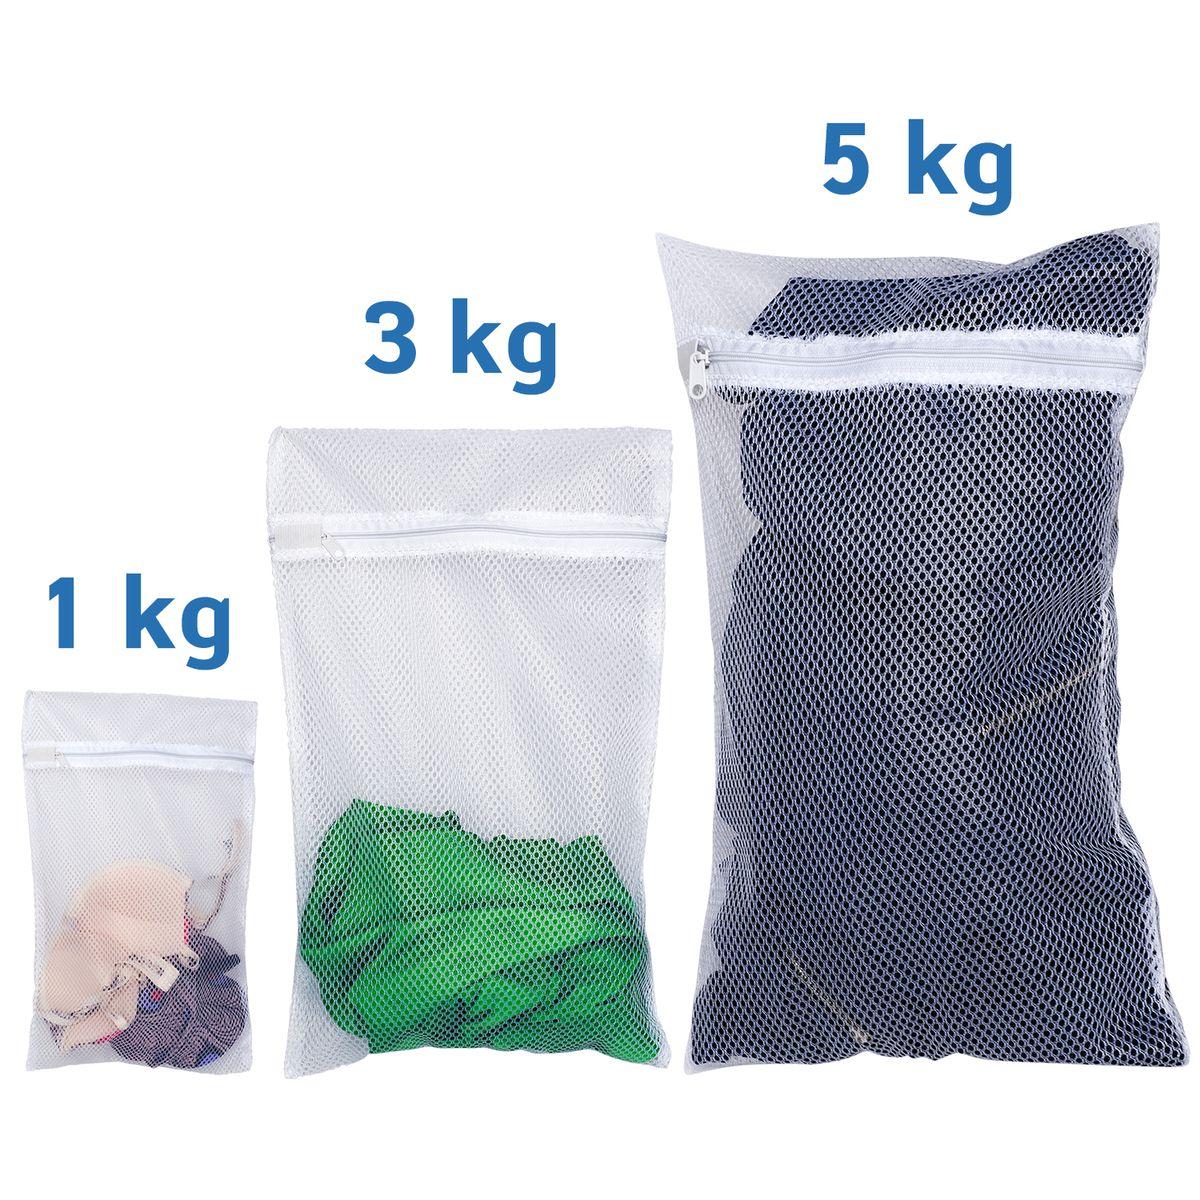 Набор мешков-сеток для стирки Artmoon